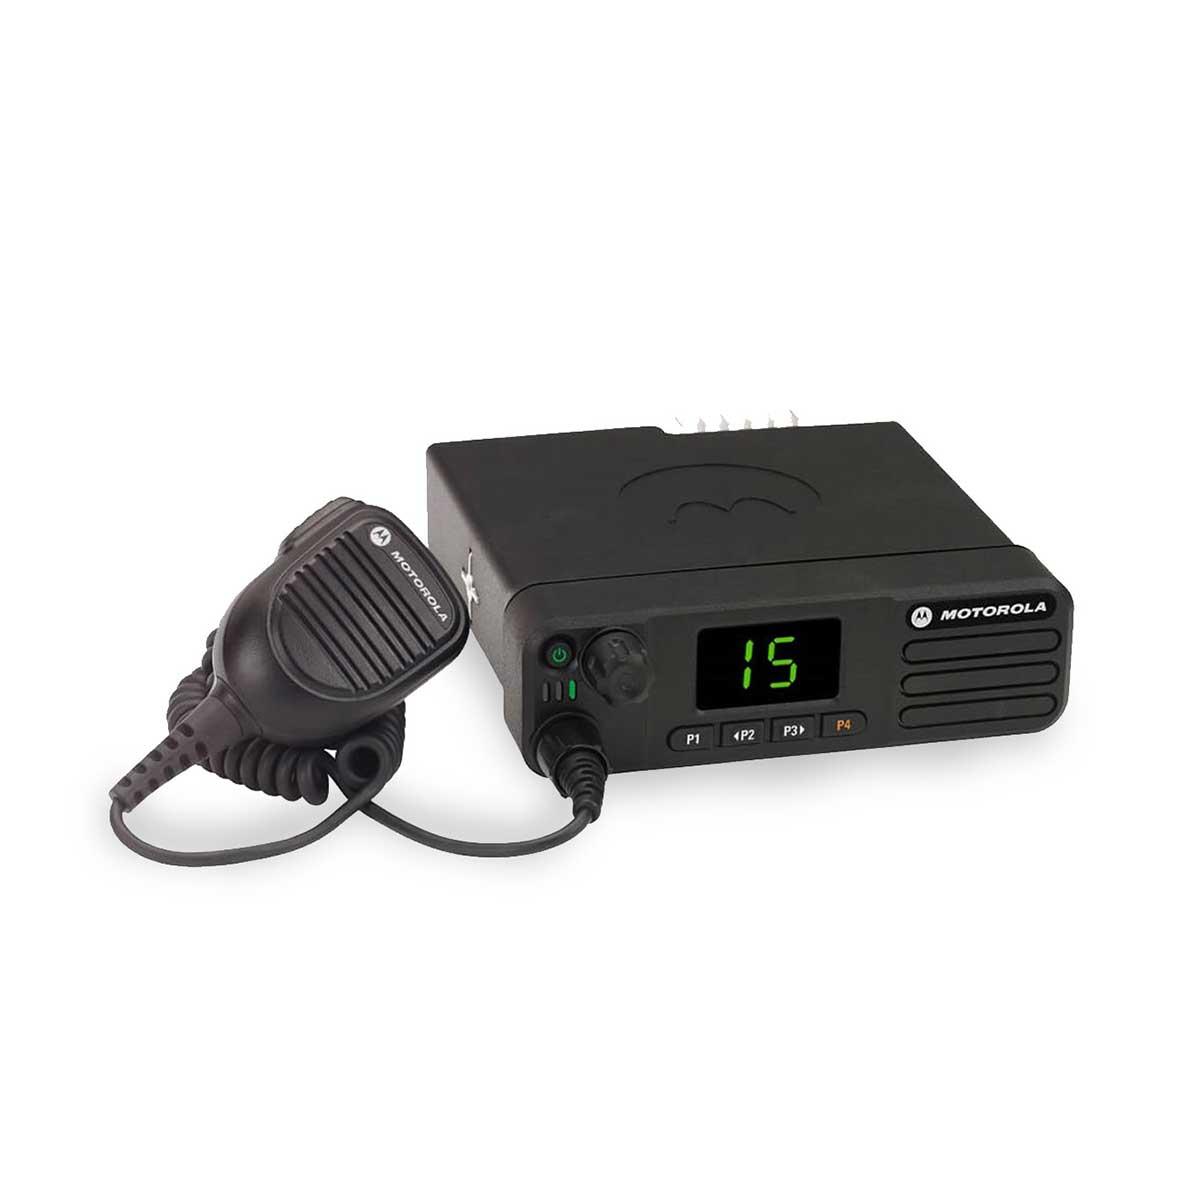 Radio Motorola DGM8000 Digital LAM28QNC9KA1AN 403-470MHZ de 25W